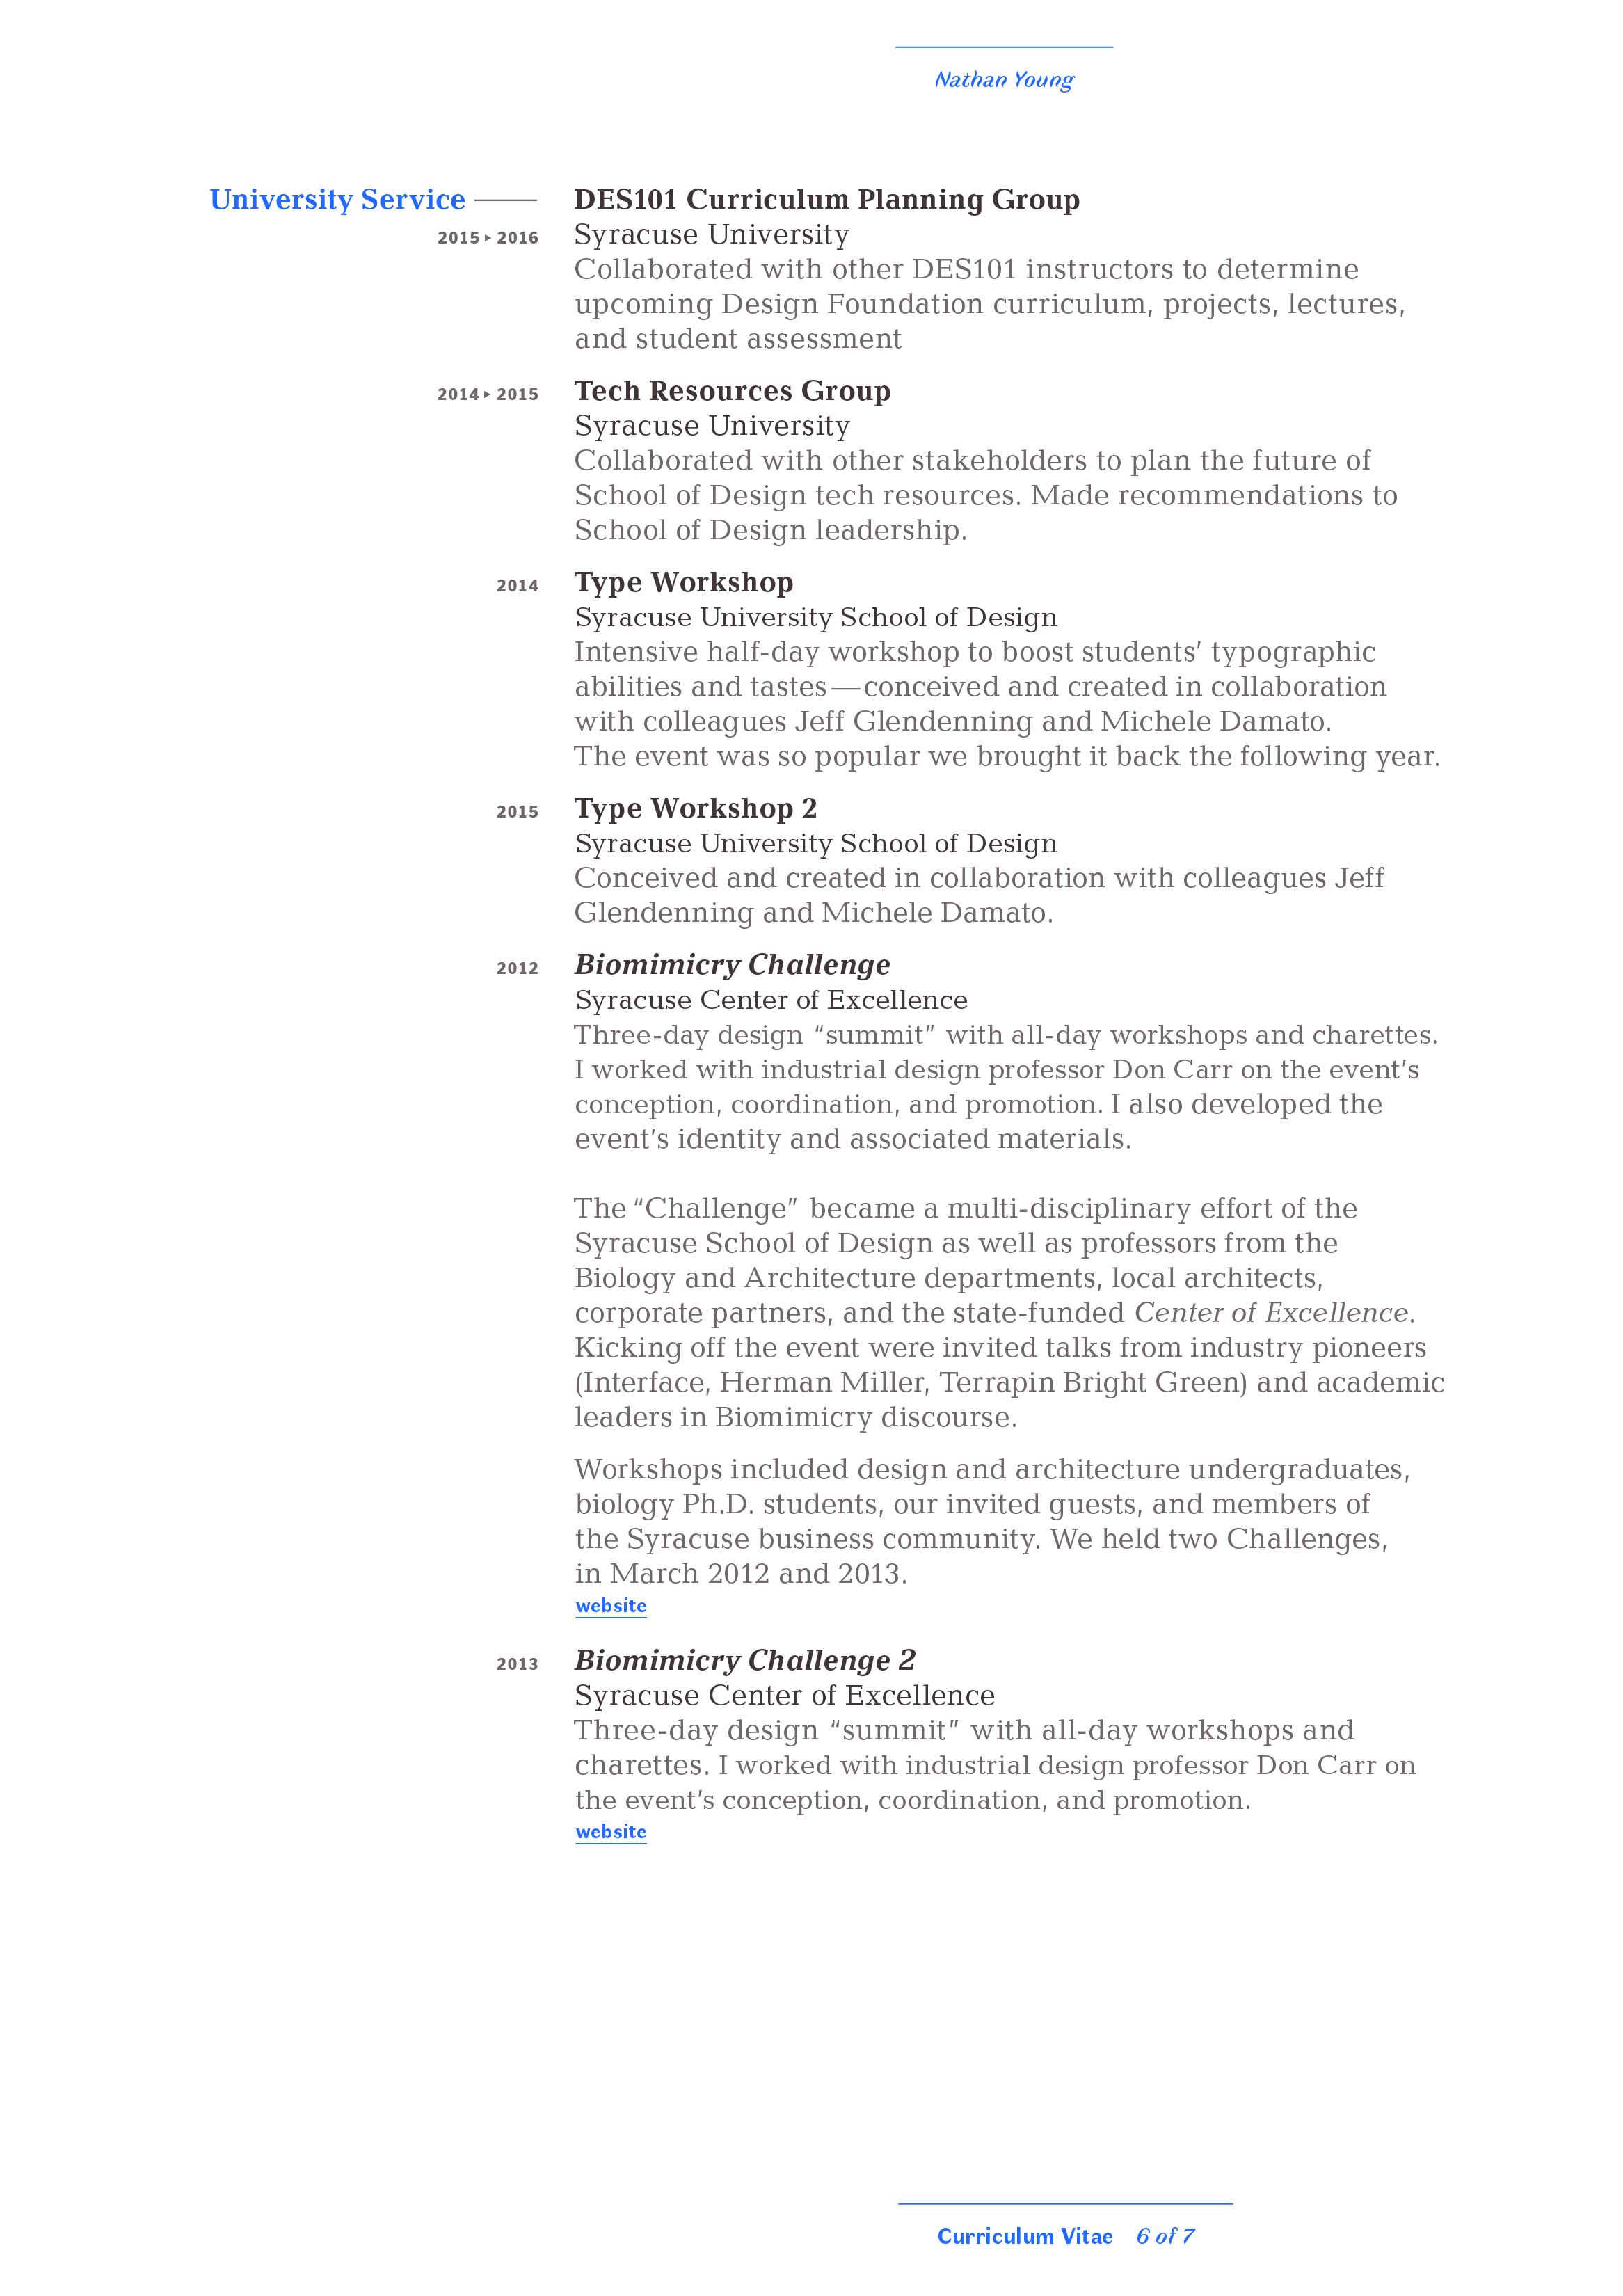 Curriculum Vitae - Nathan Young » Graphic Designer